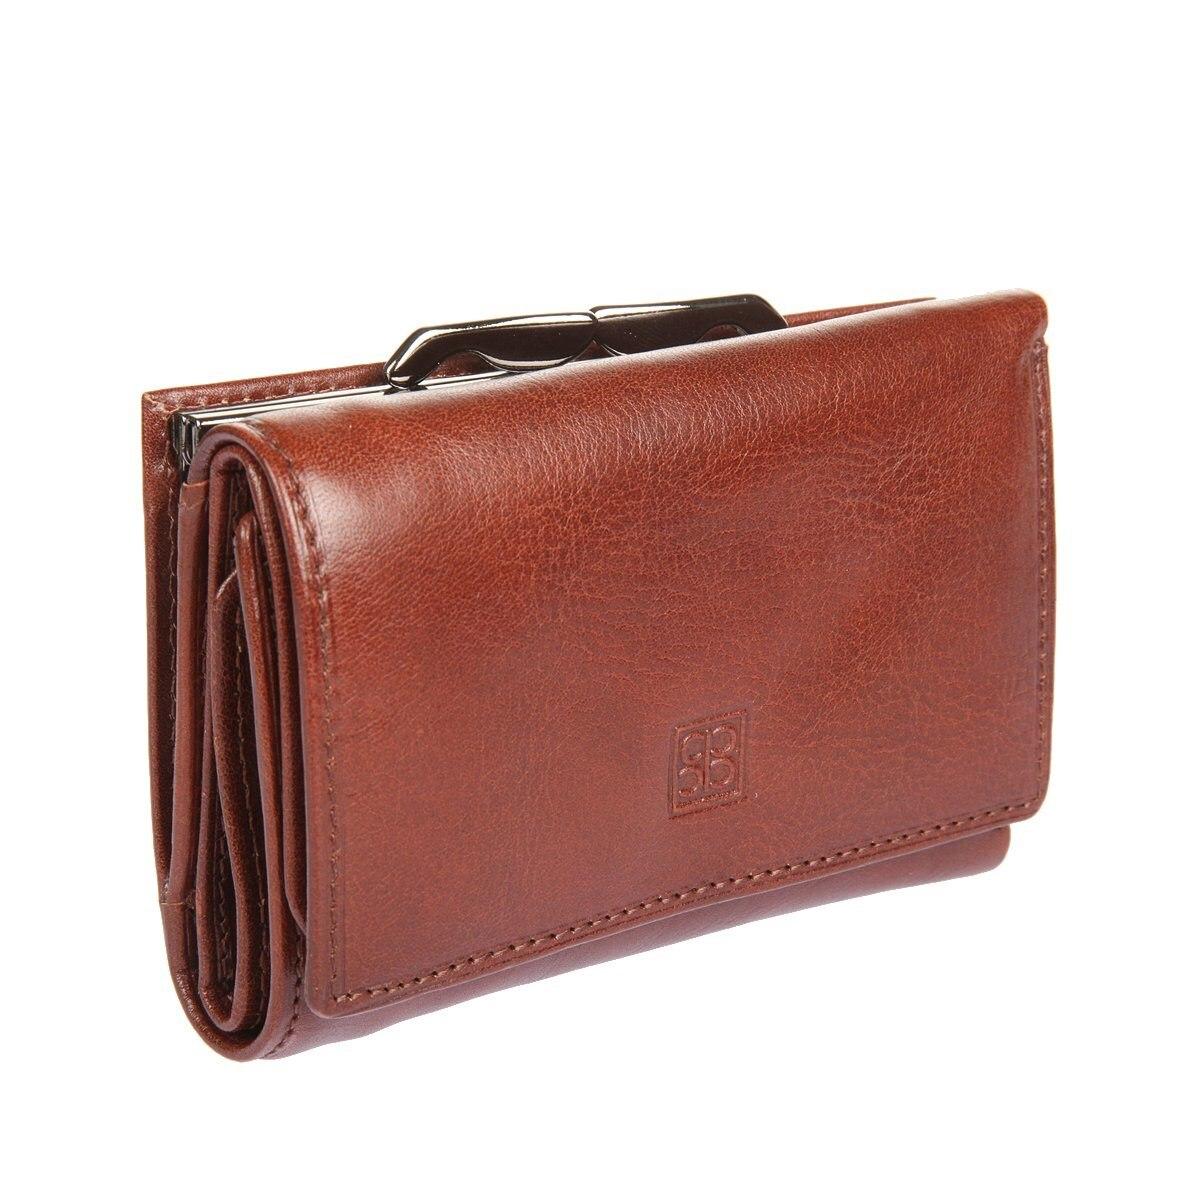 Coin Purse Sergio Belotti 2101 Milano Brown women 3 cute cat short wallet animal printing purse card holder coin bags